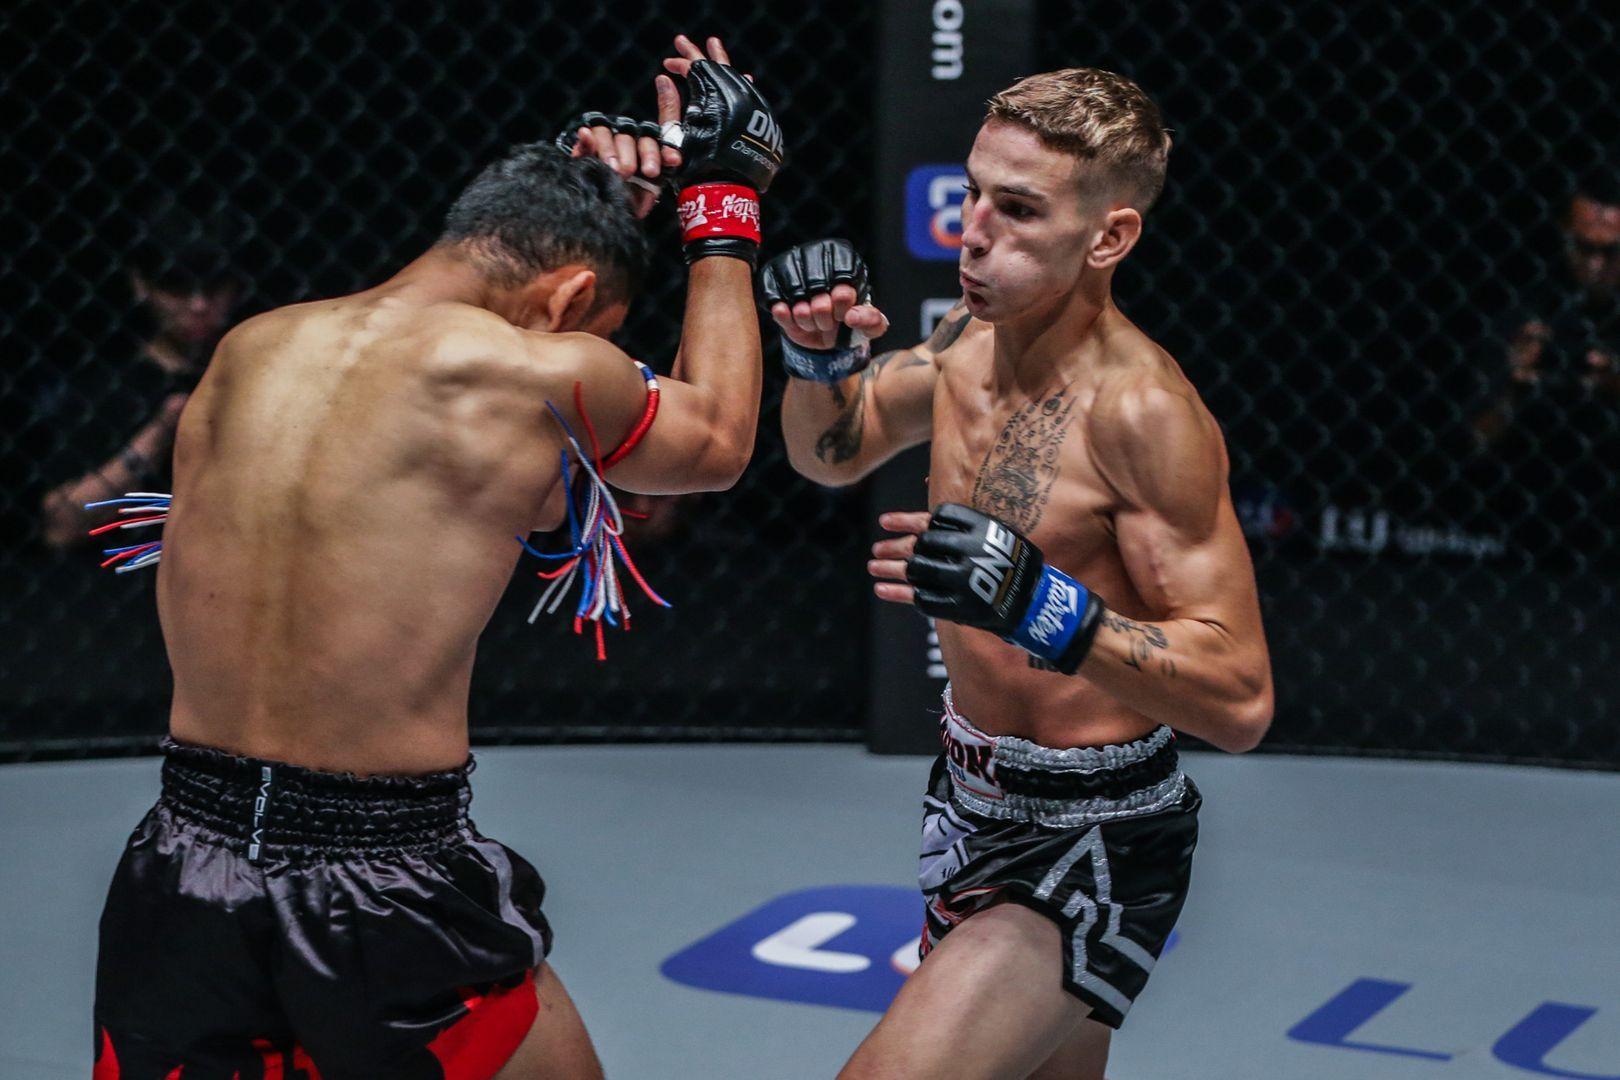 Rocky-Ogden-punches-Sam-A